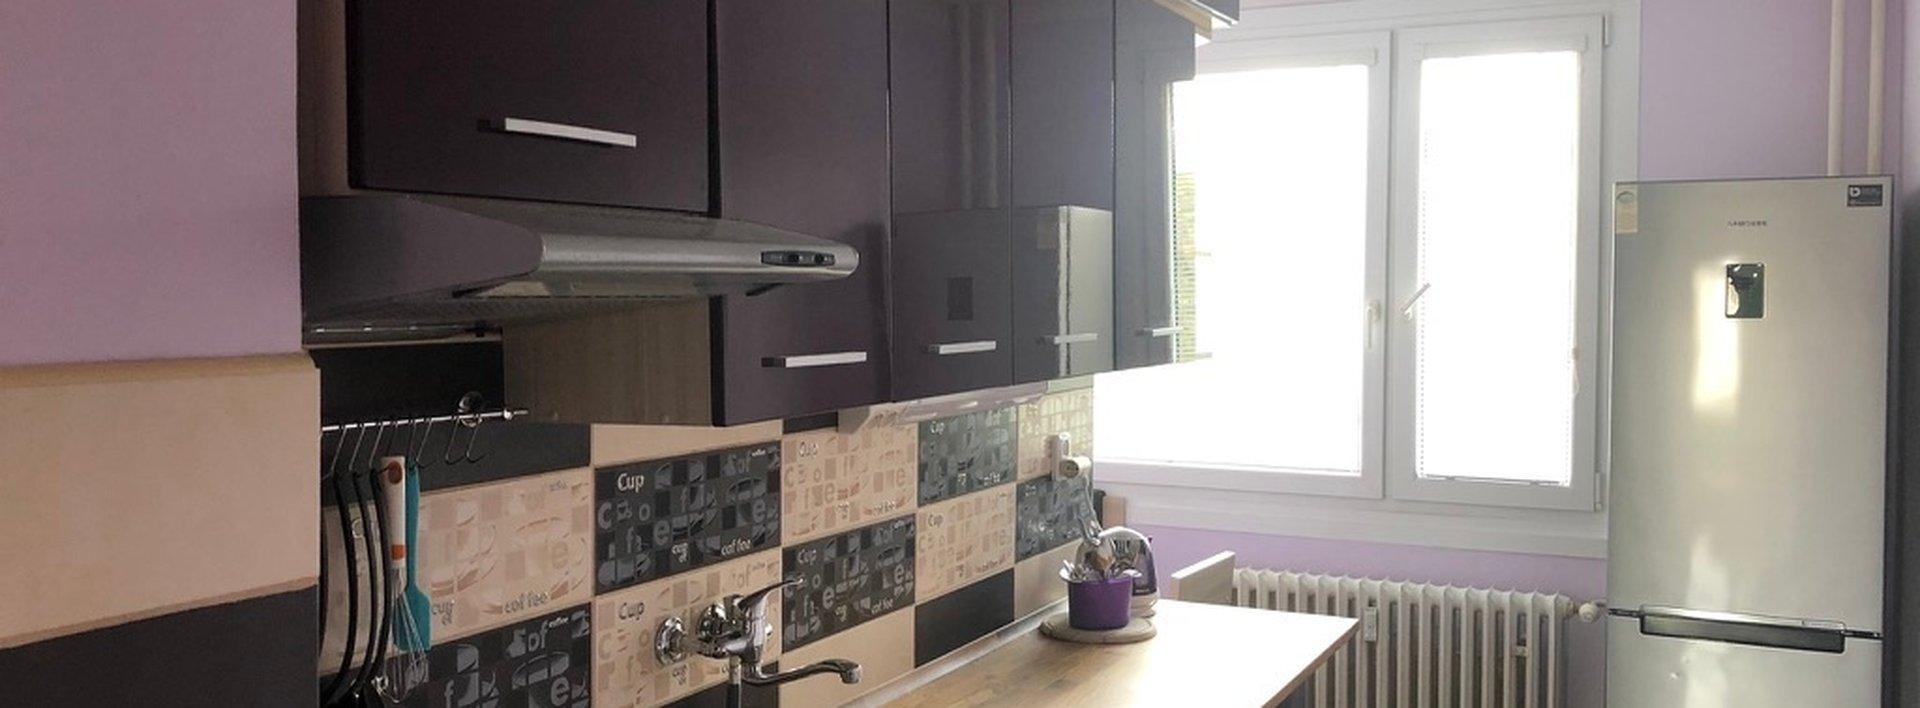 Pronájem bytu 2+1, 60 m² - Liberec XIV-Ruprechtice, Ev.č.: N49035